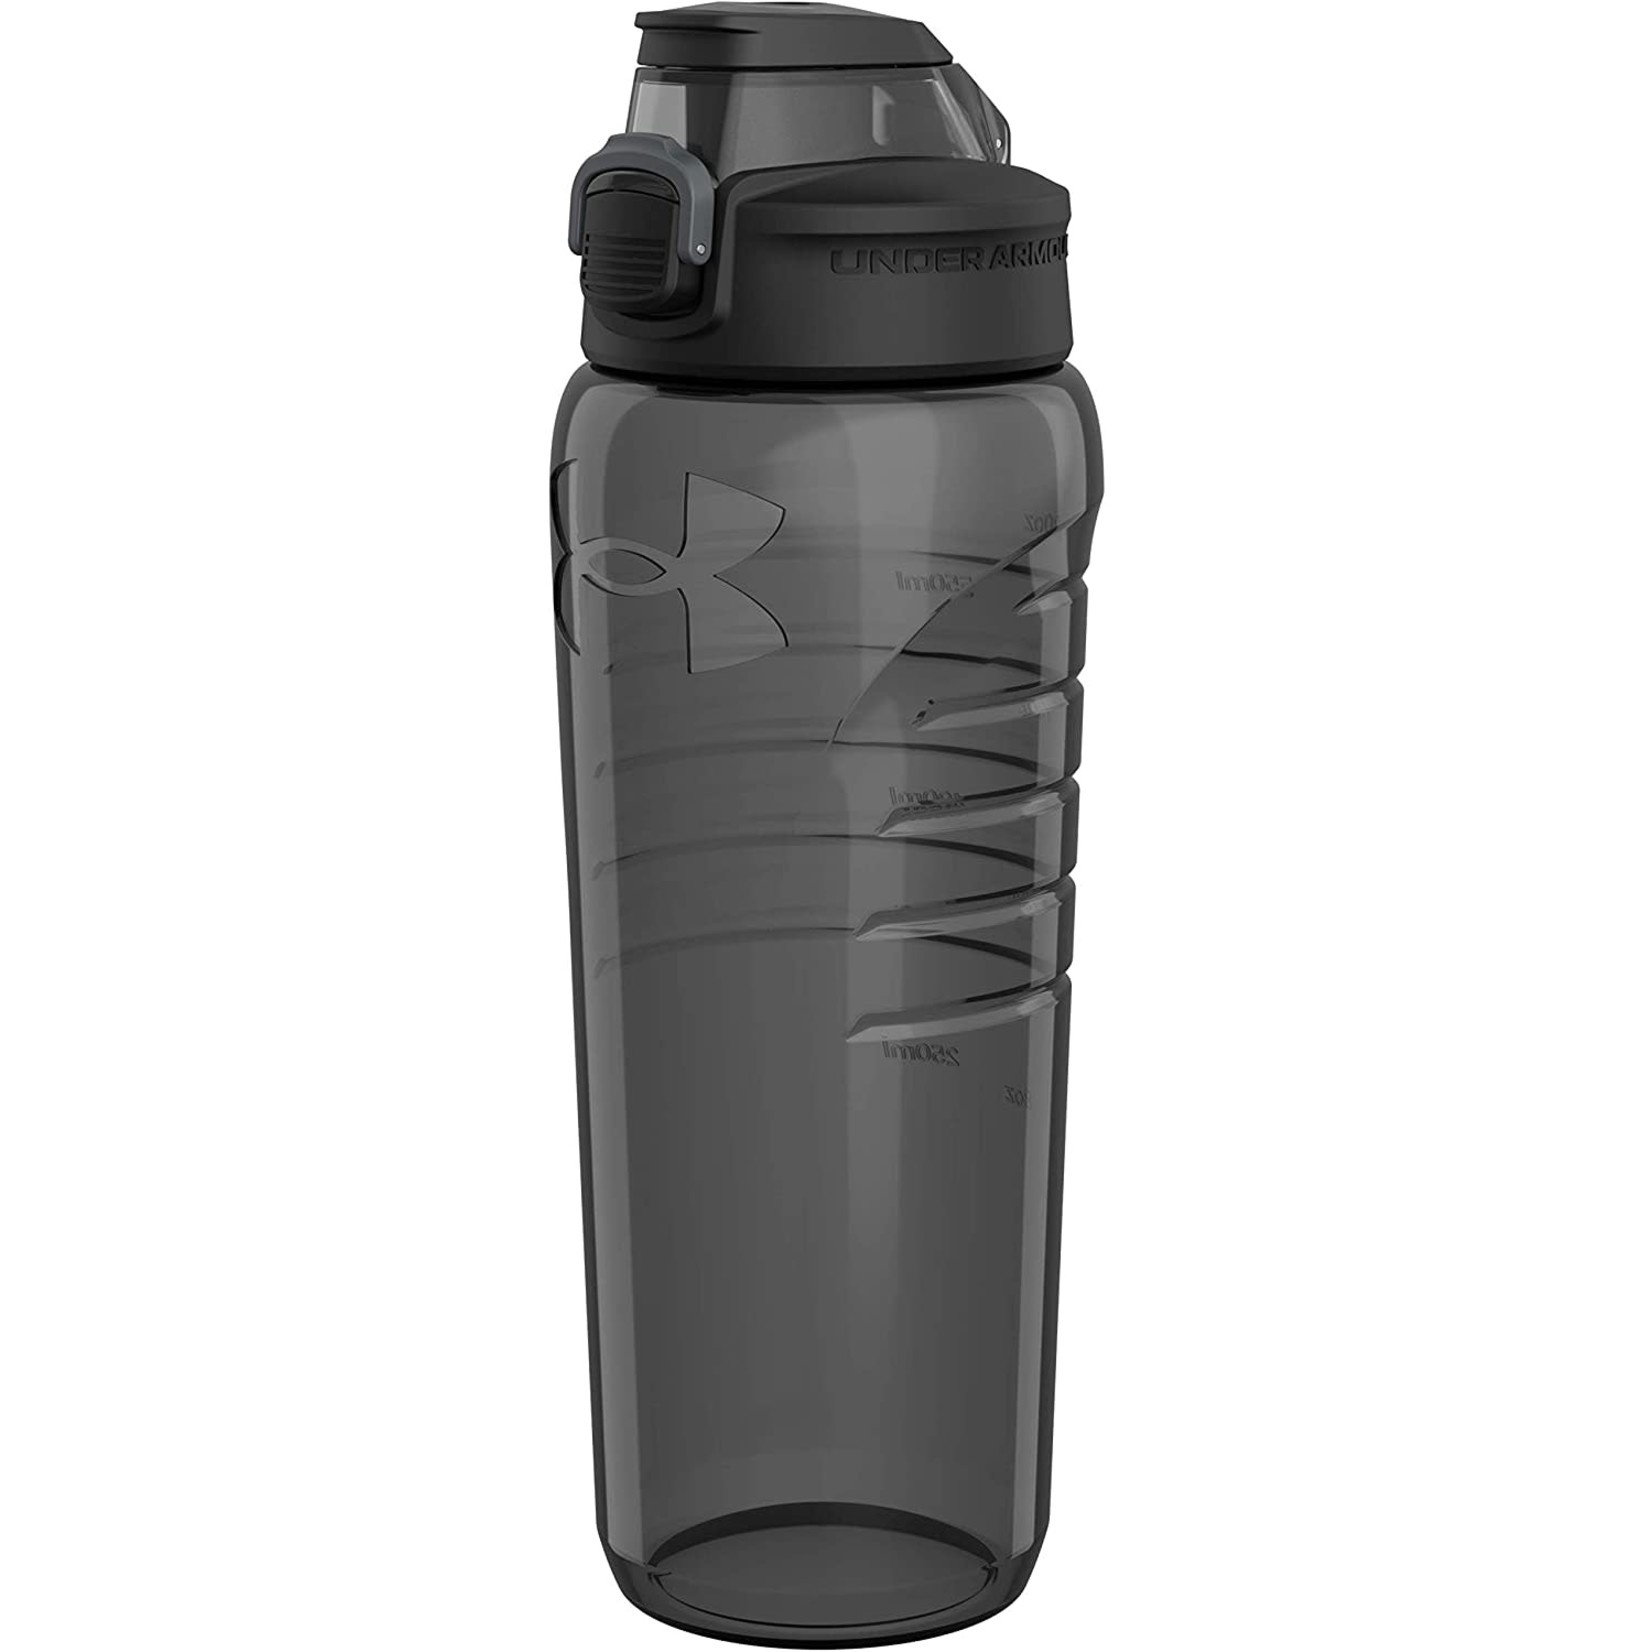 Under Armour Under Armour Water Bottle, 24oz Draft